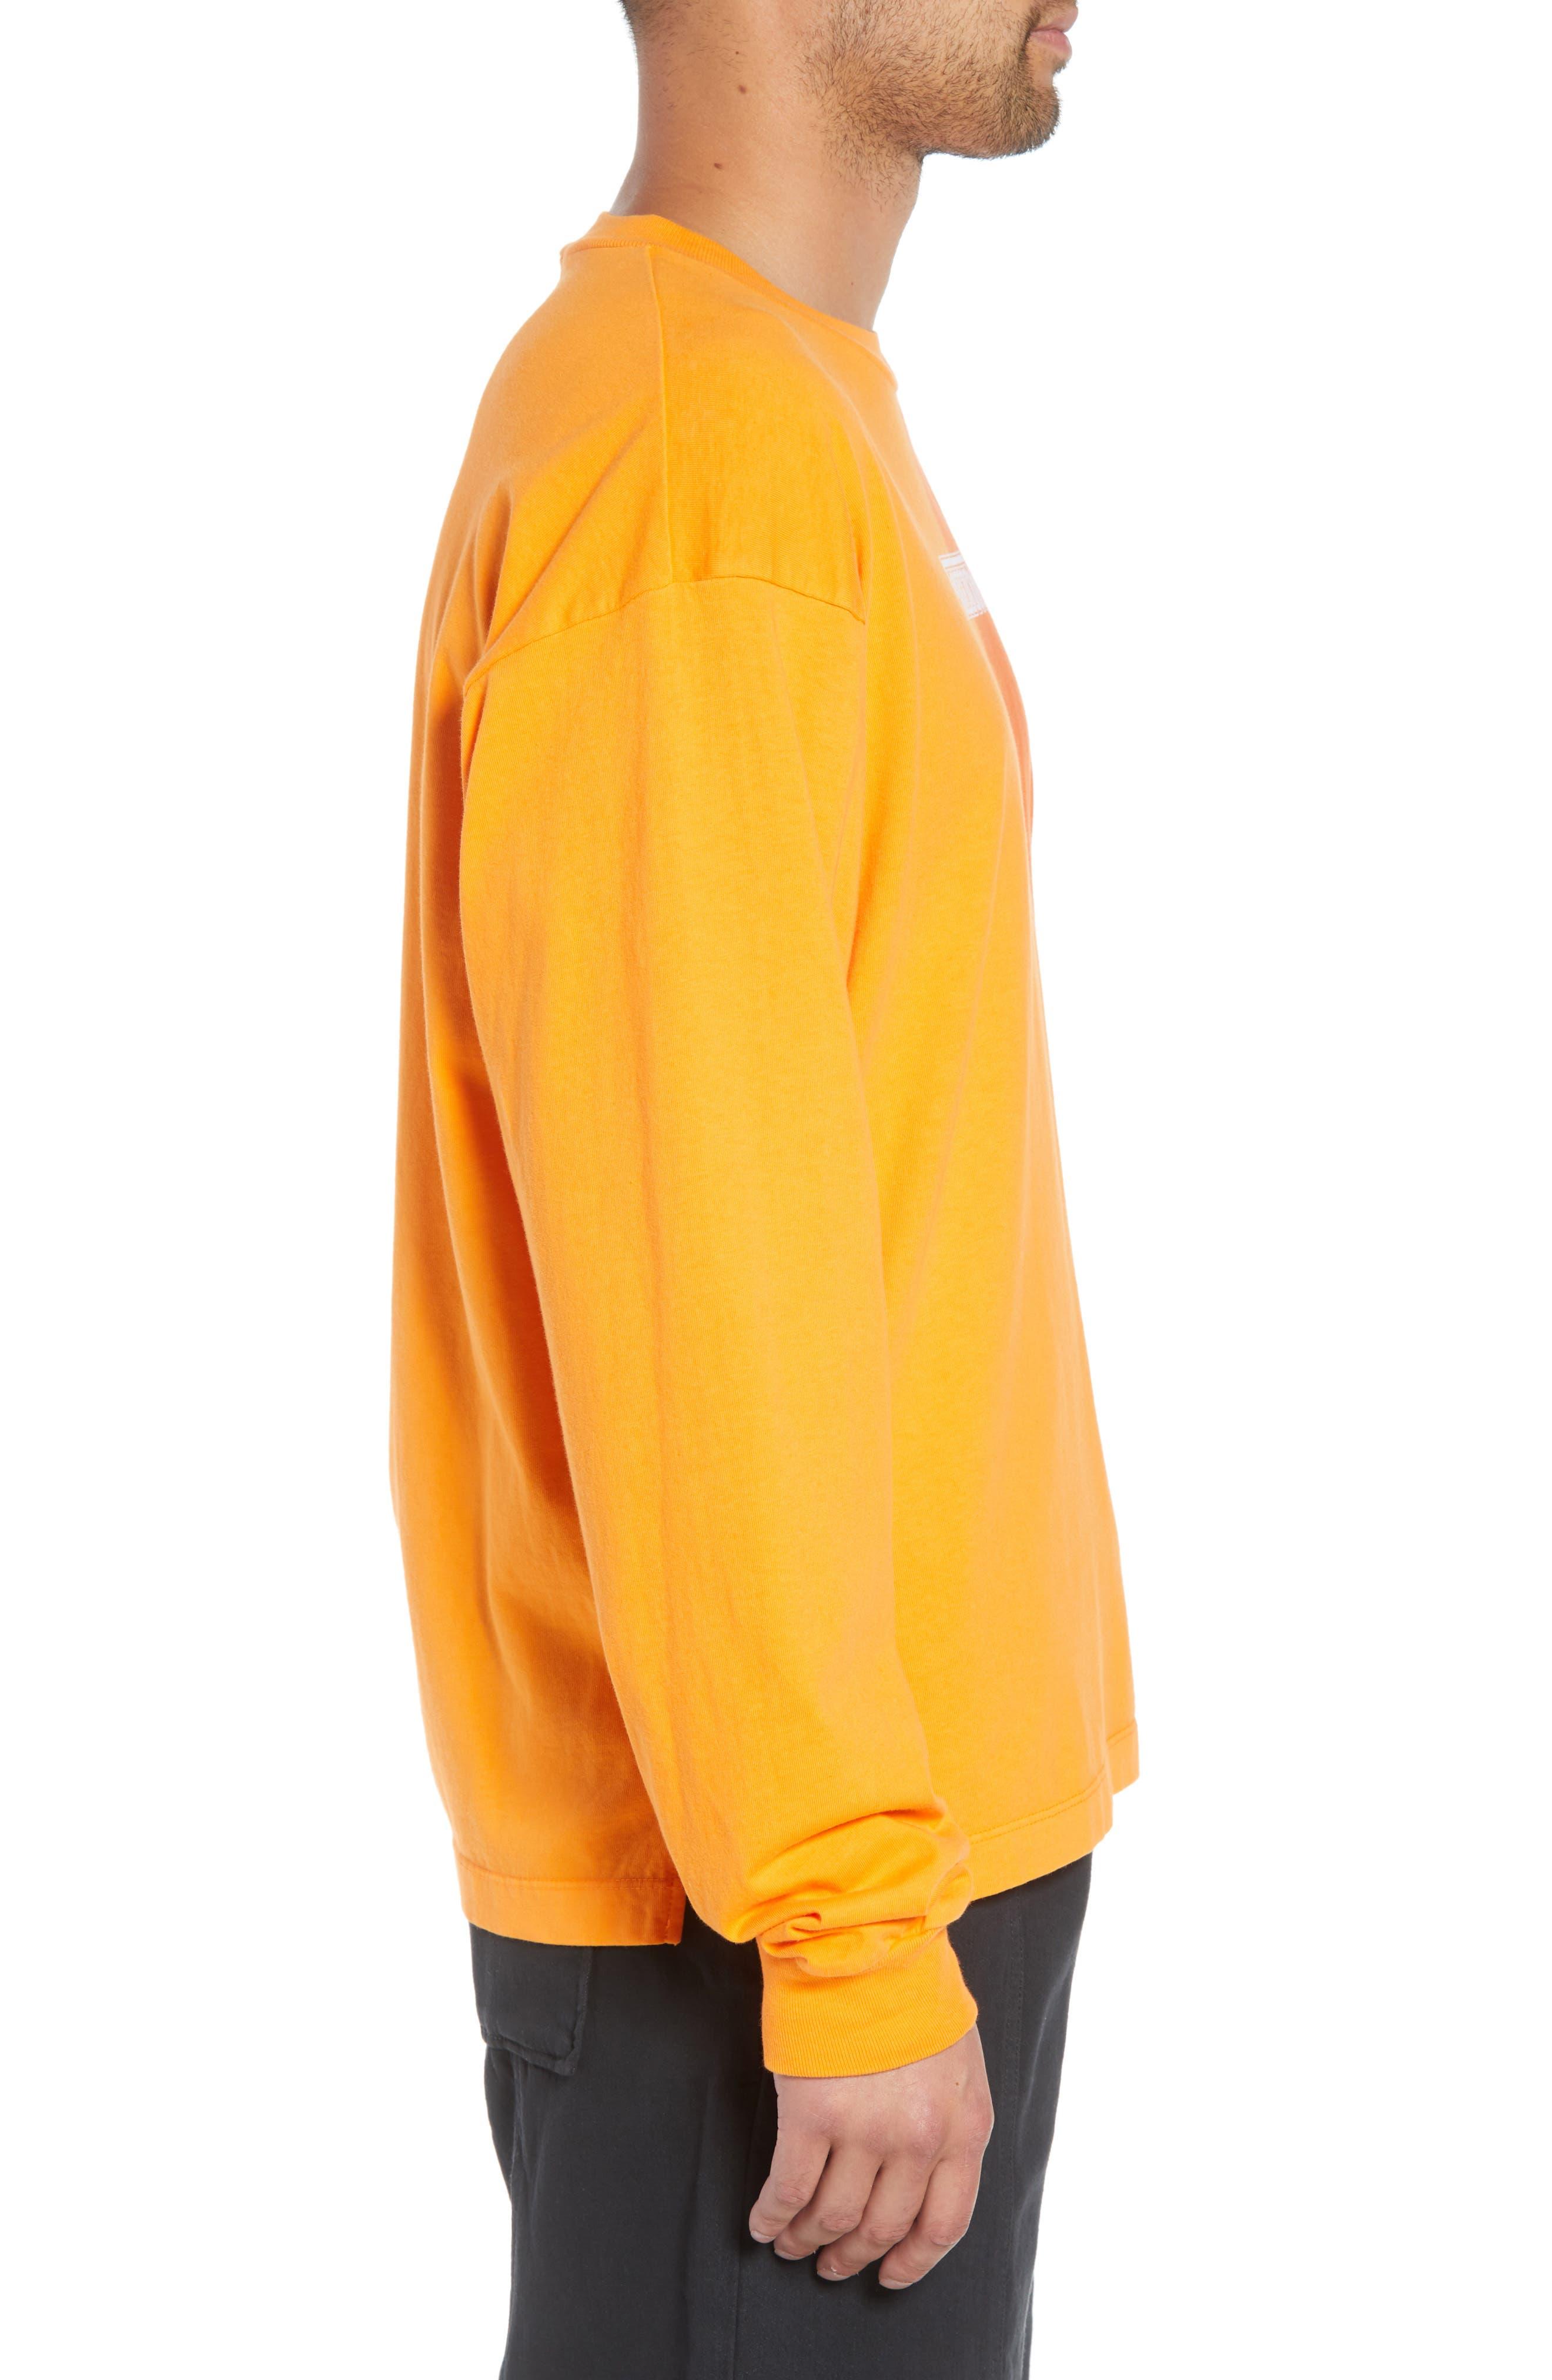 DRIFTER,                             Atari Long Sleeve T-shirt,                             Alternate thumbnail 3, color,                             820